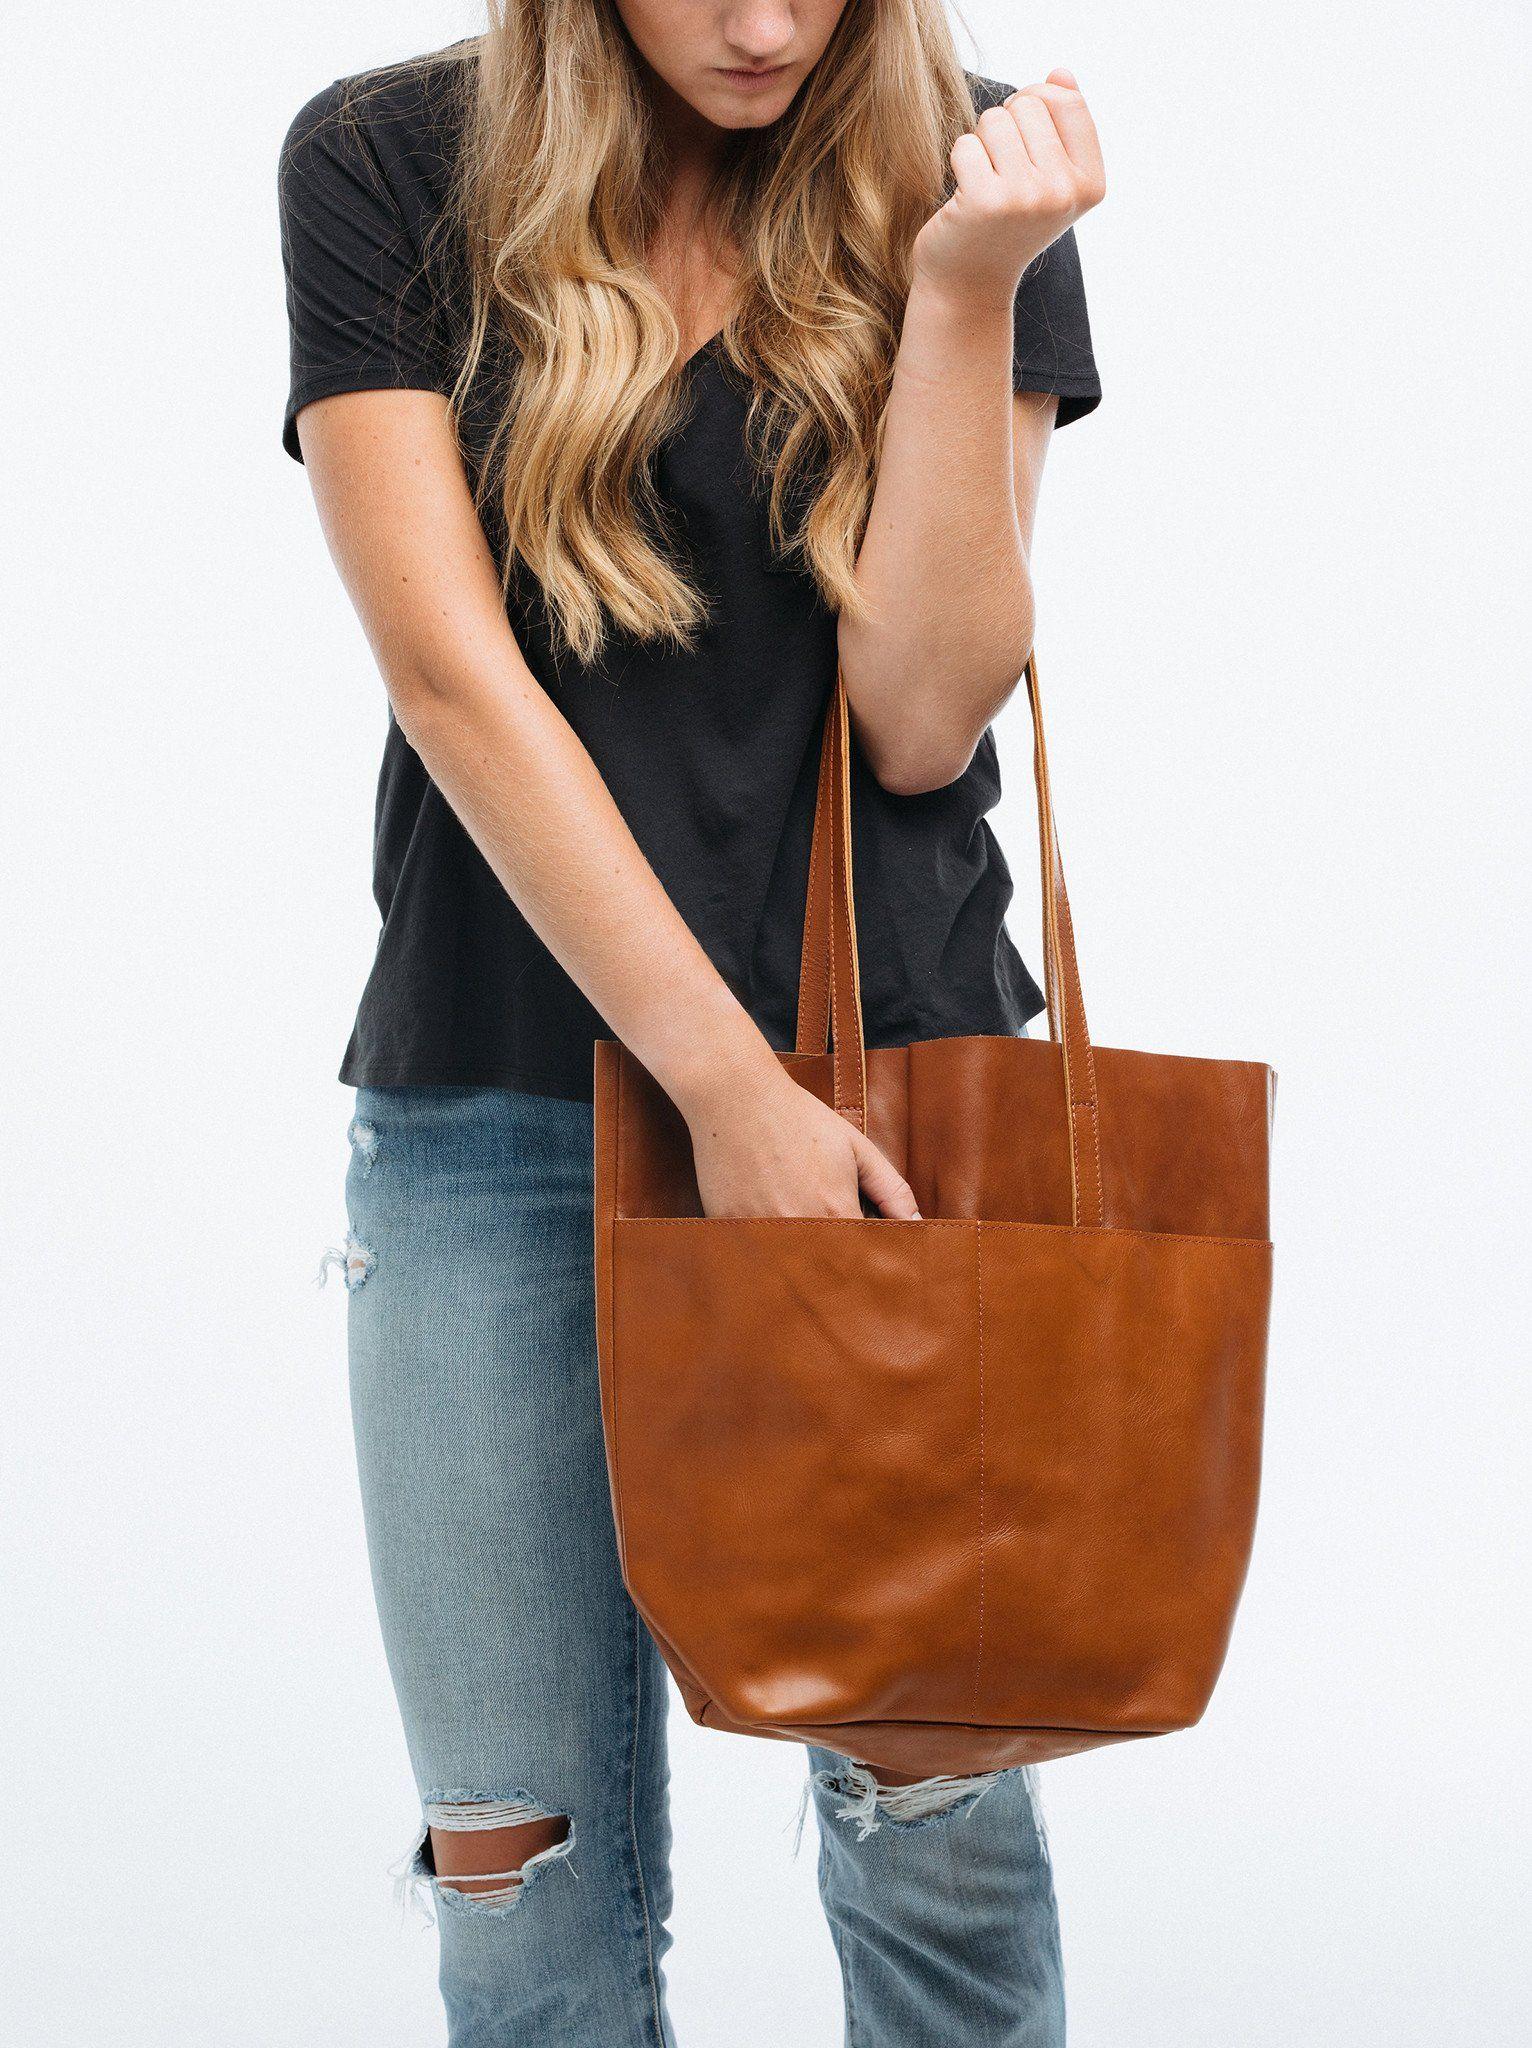 70367de22fb4 Selam Tote   Bags   Purses, bags, Leather, Fashion